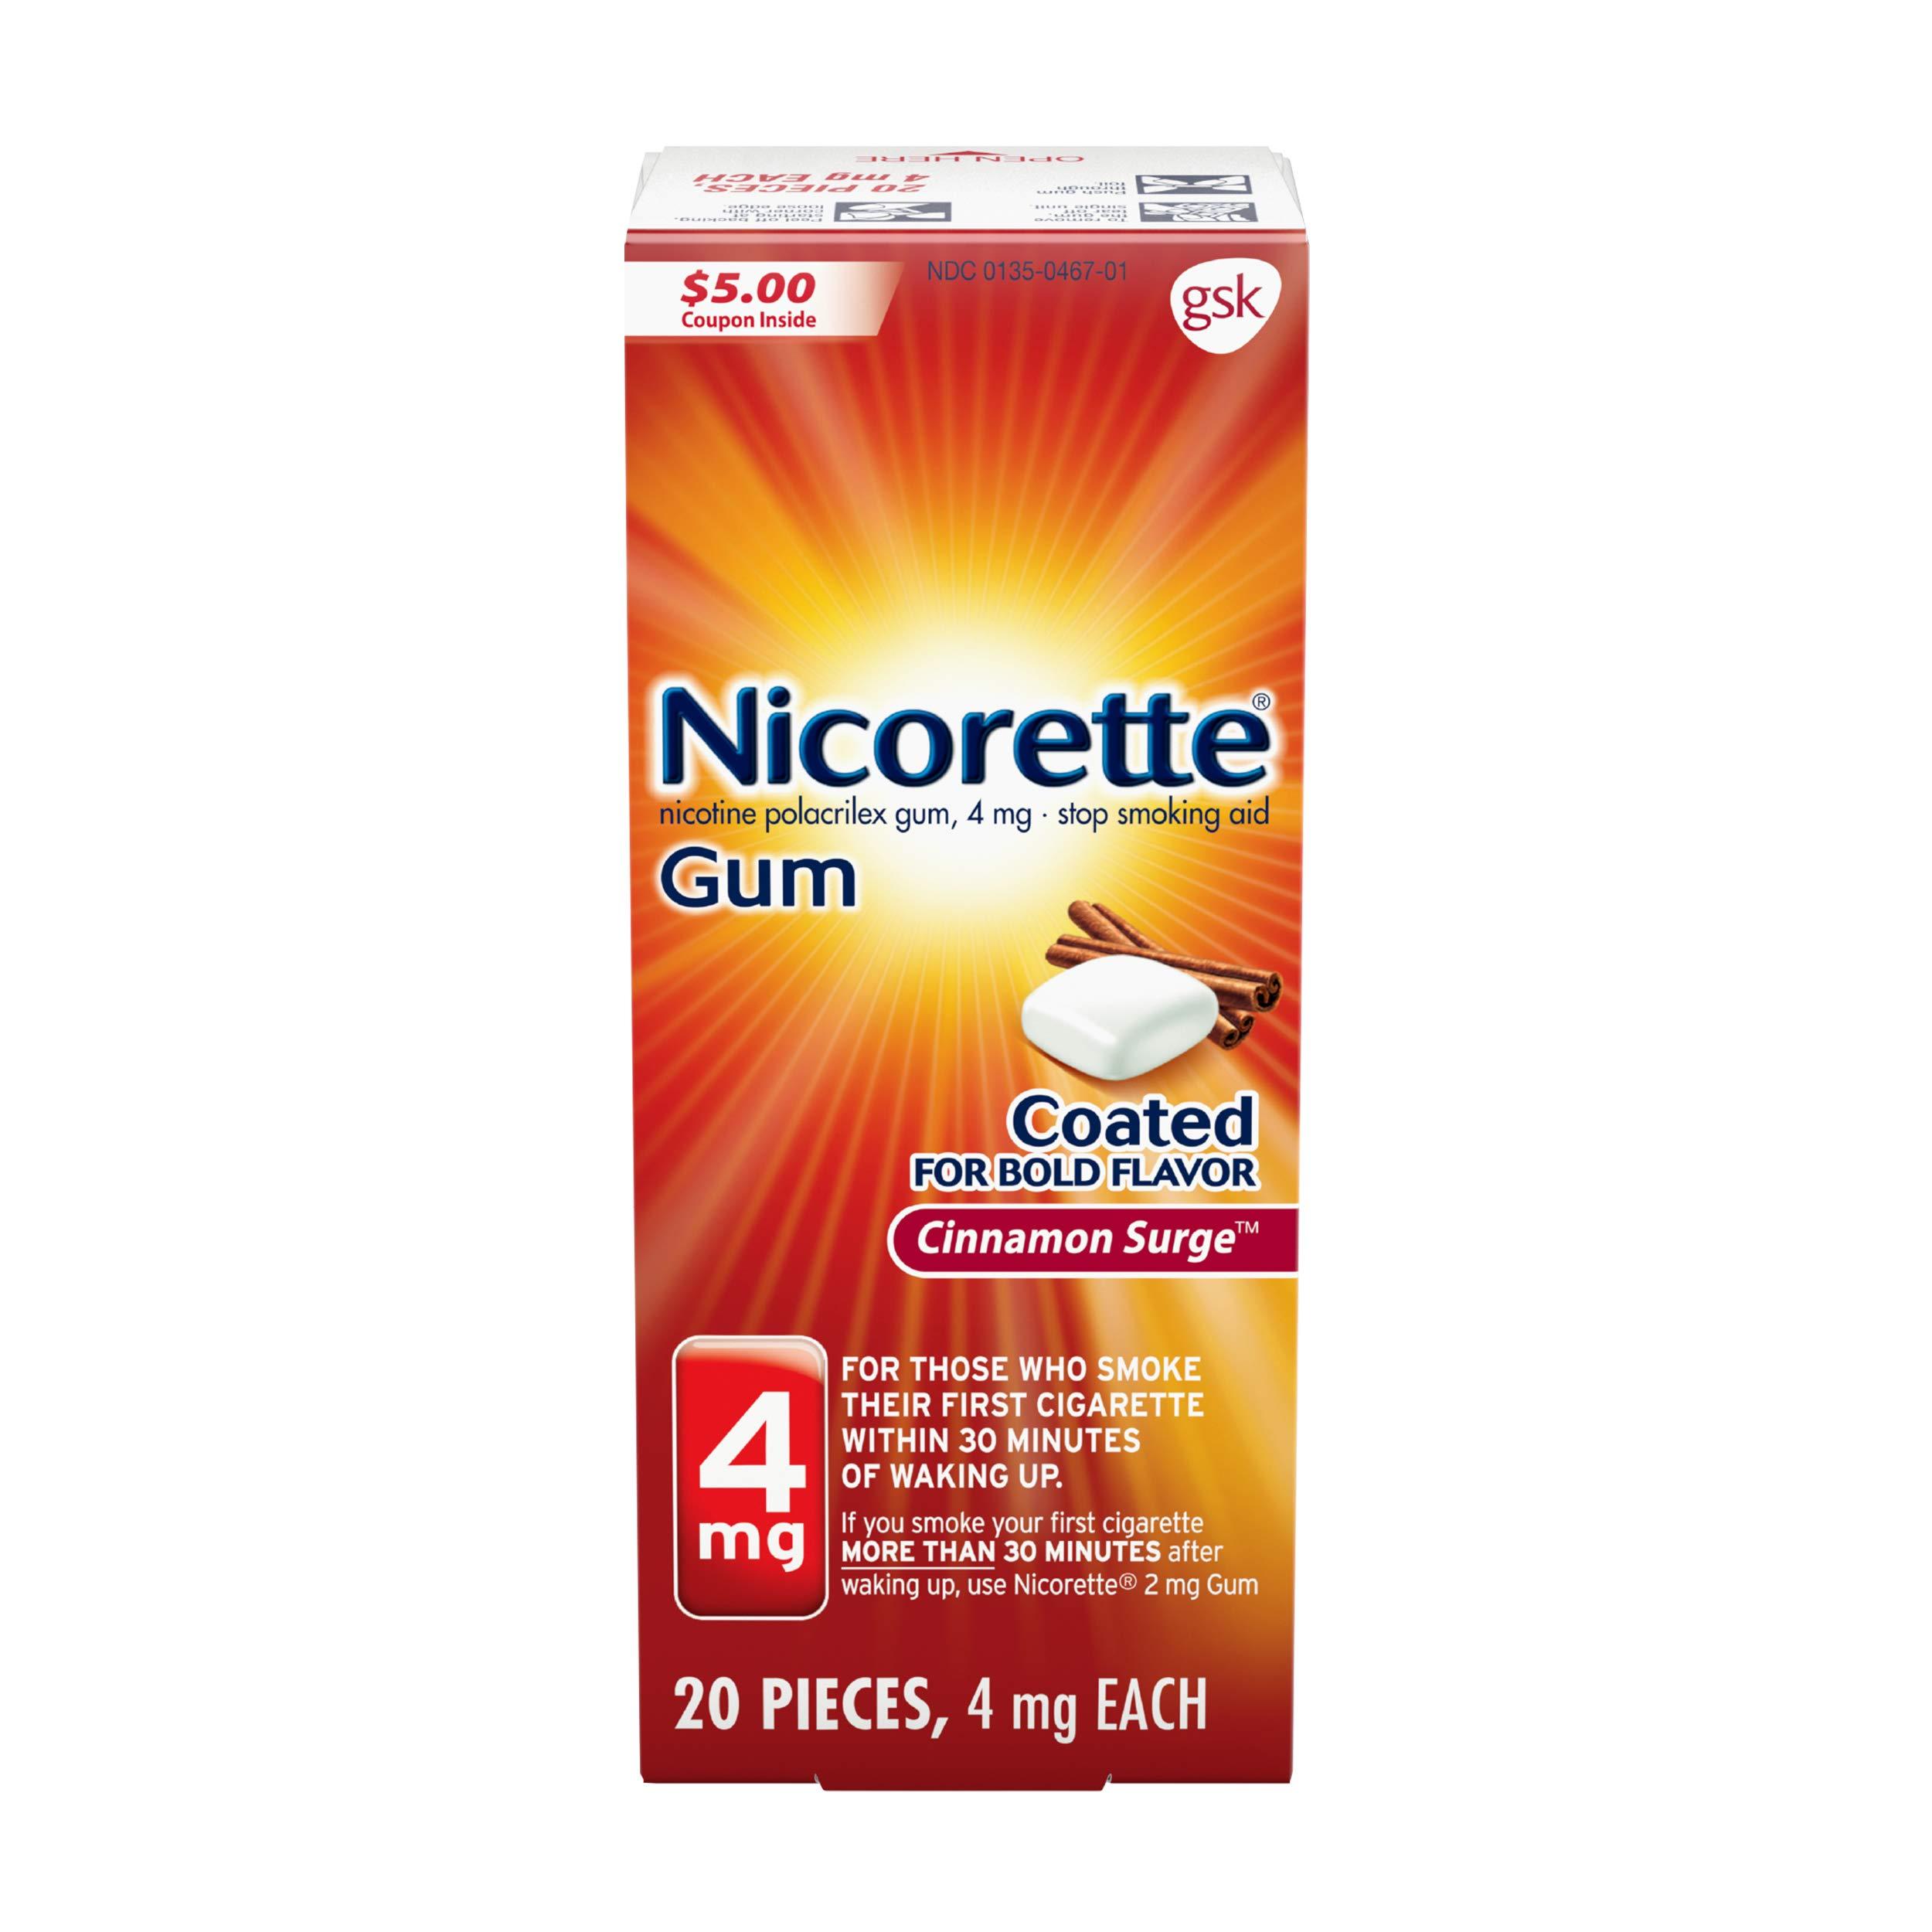 Nicorette Coated Gum, Cinnamon Surge, 4mg, 20-Count